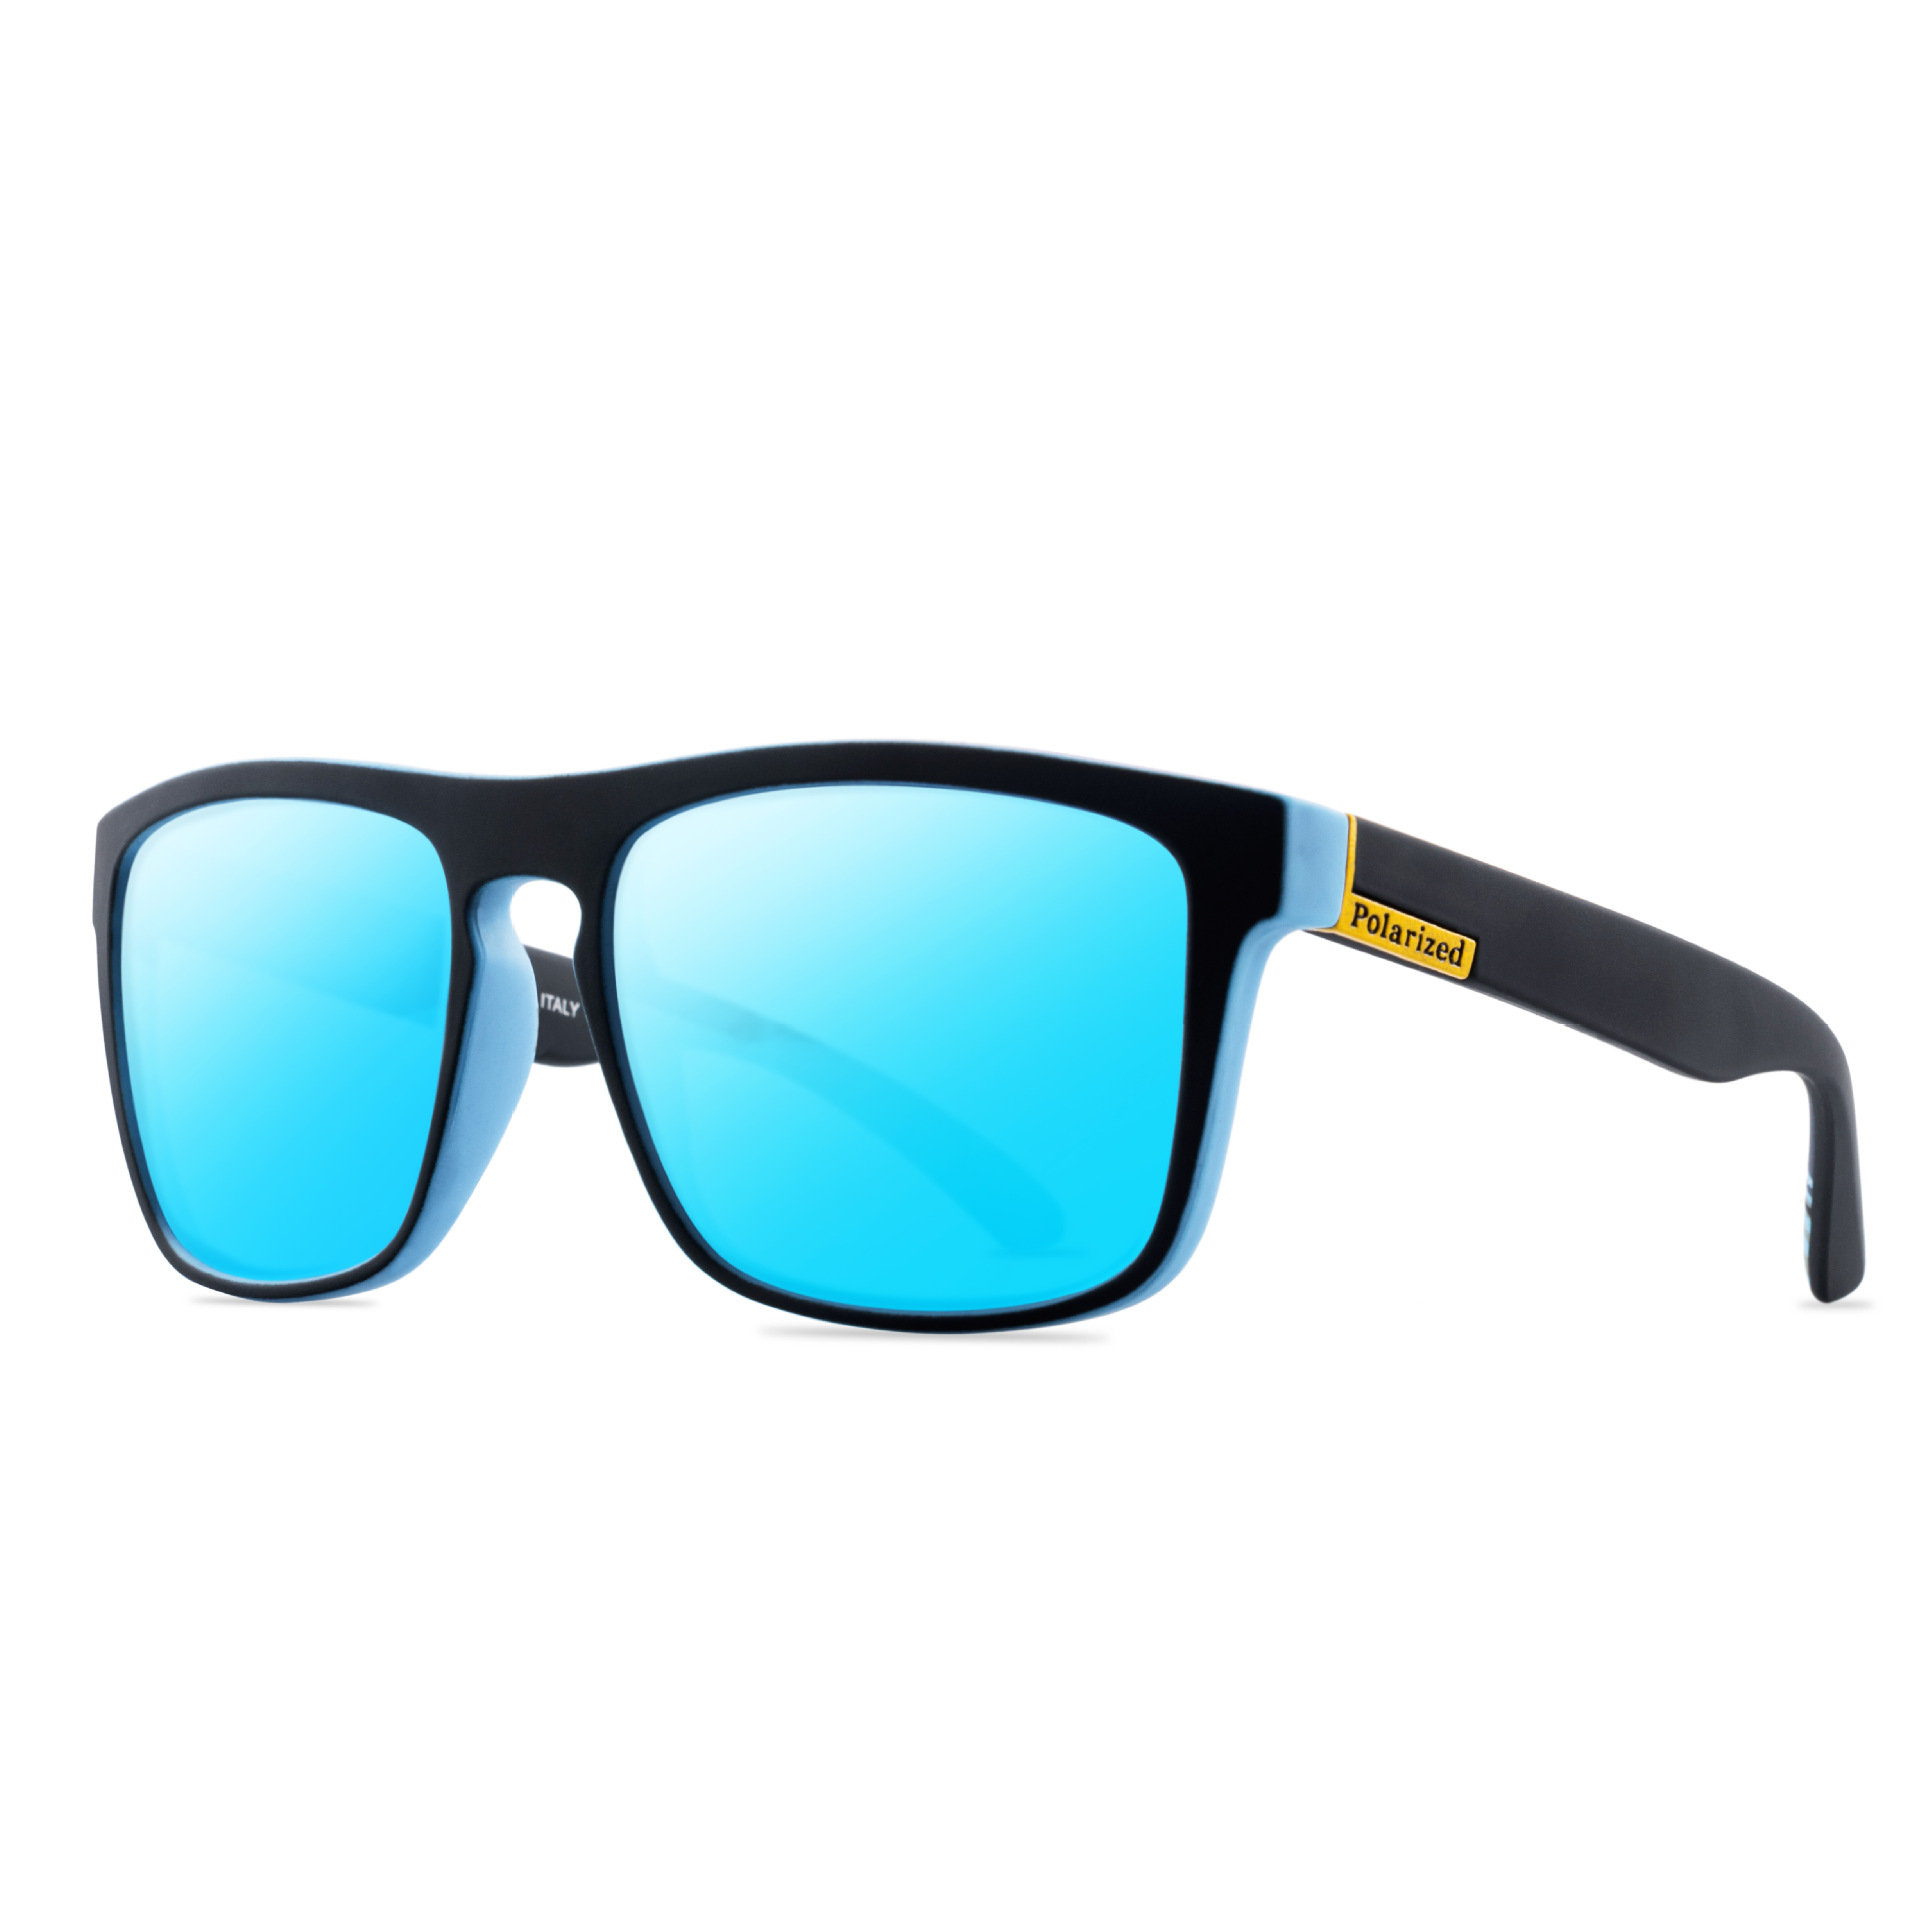 Polarized Sunglasses Men's Driving Shades Male Sun Glasses For Men Retro Cheap Luxury Women Brand Designer UV400 Gafas 6